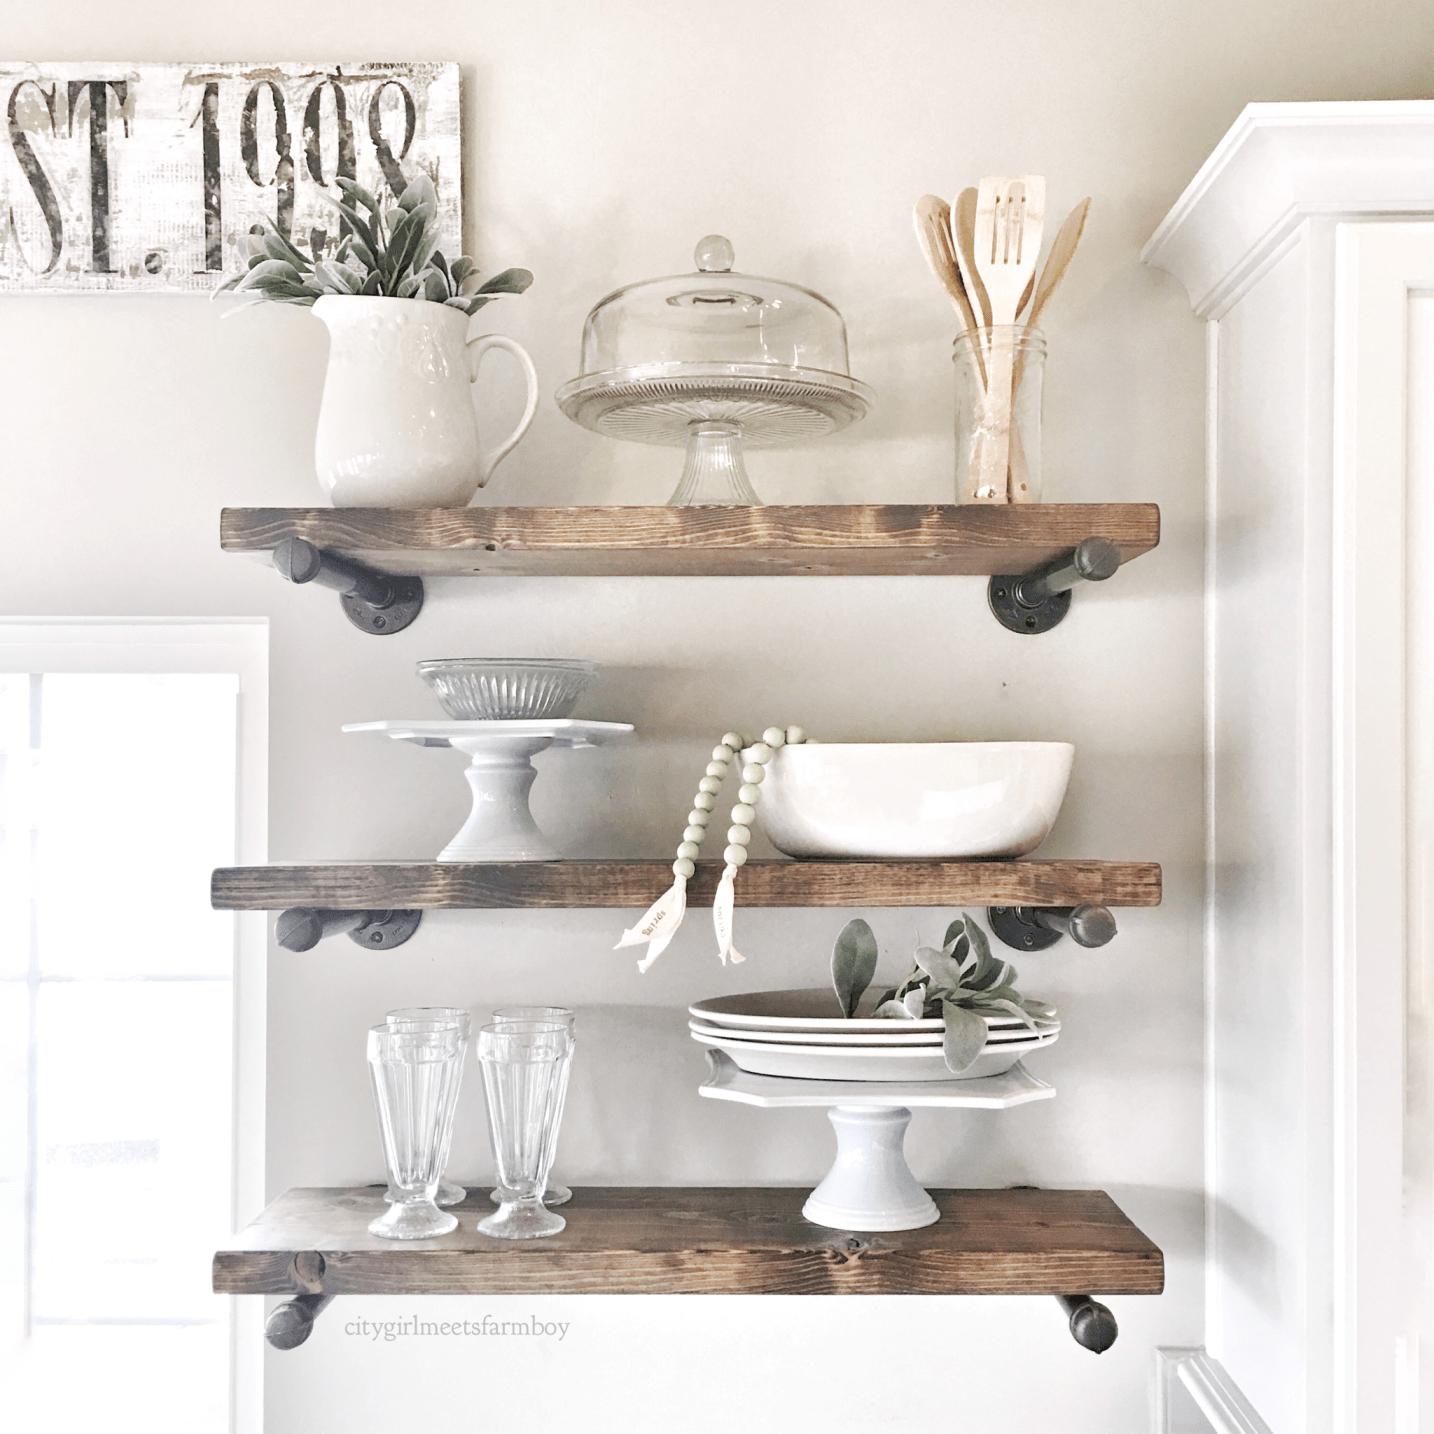 21 open shelving kitchen ideas you can diy diy kitchen shelves kitchen cabinet design on kitchen decor open shelves id=15244